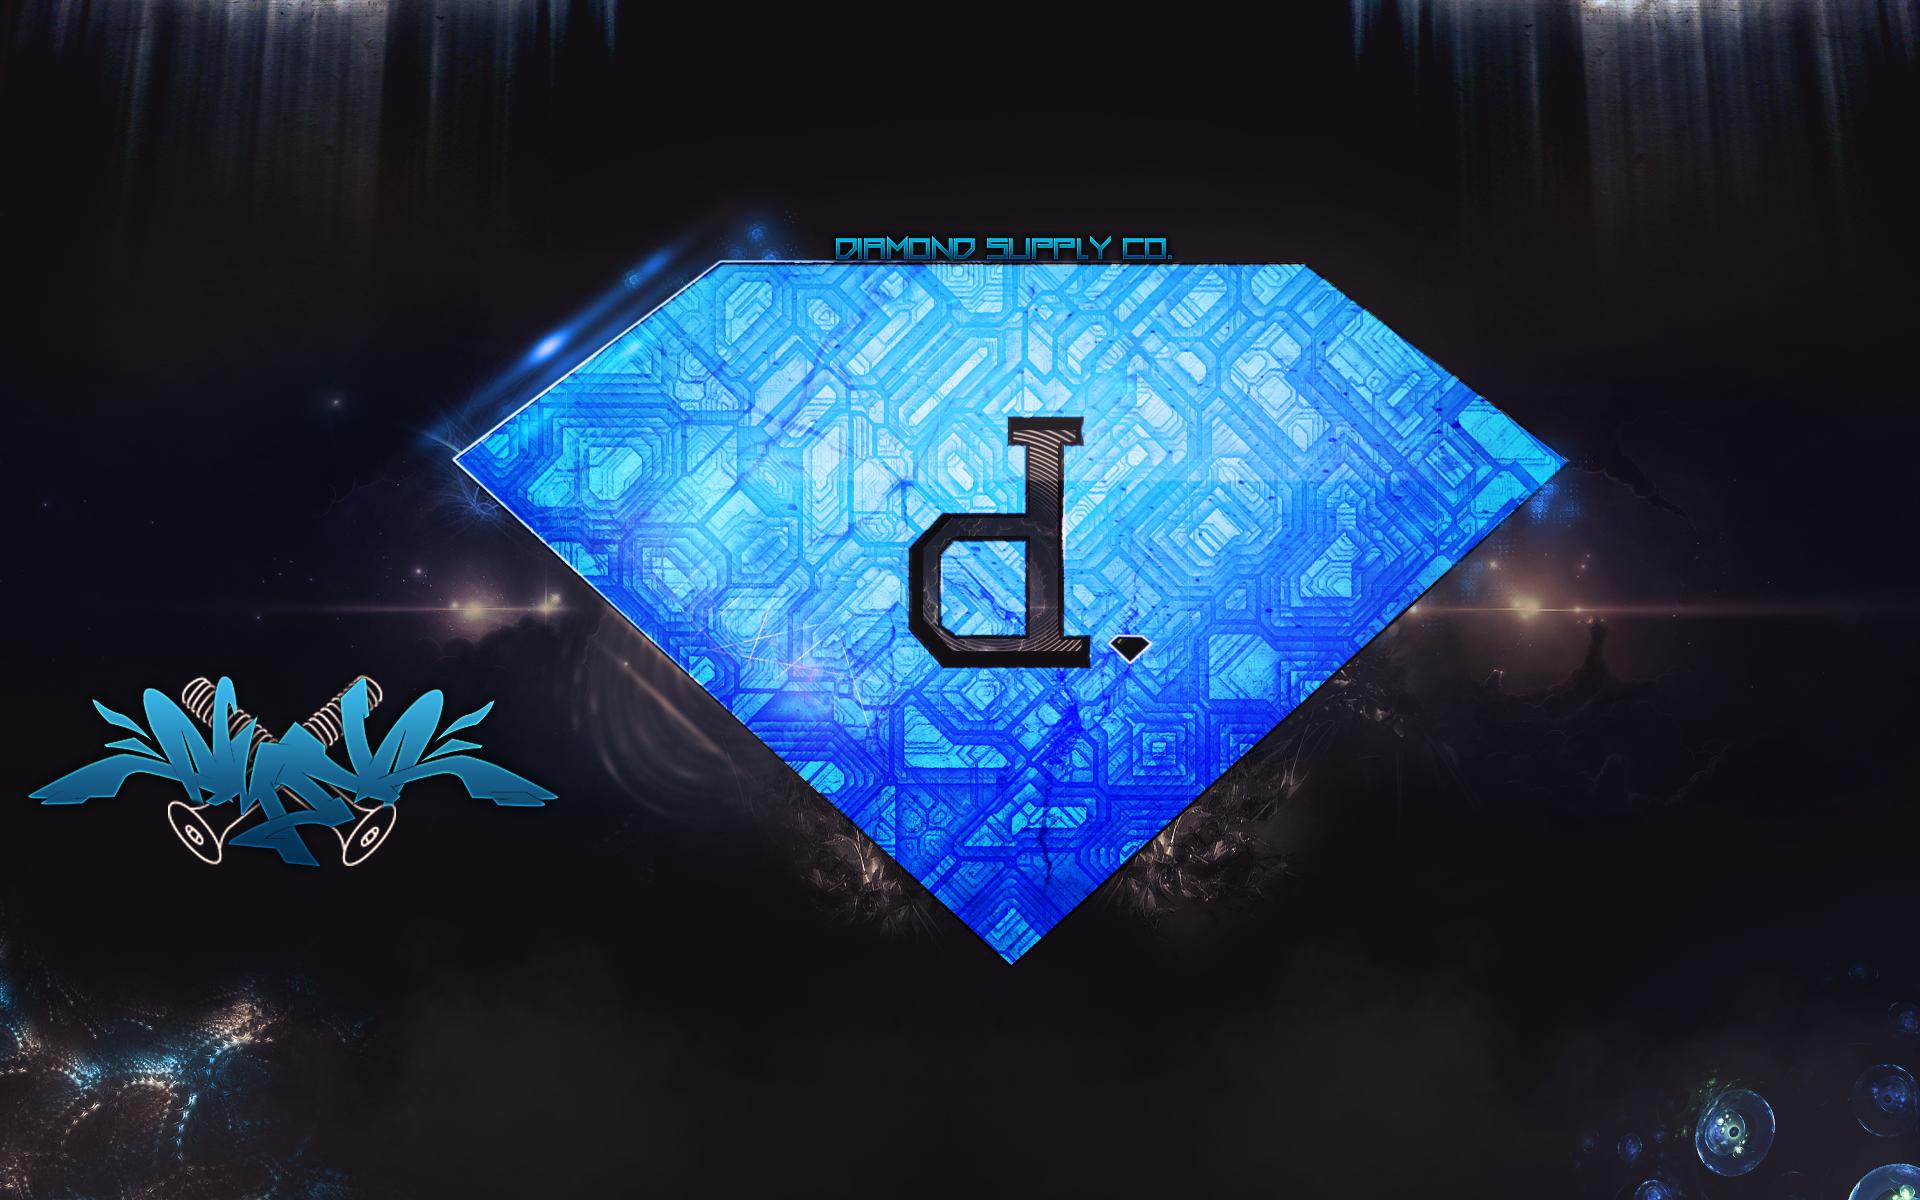 Diamond Supply Co Wallpaper by FlowDesiigns on DeviantArt